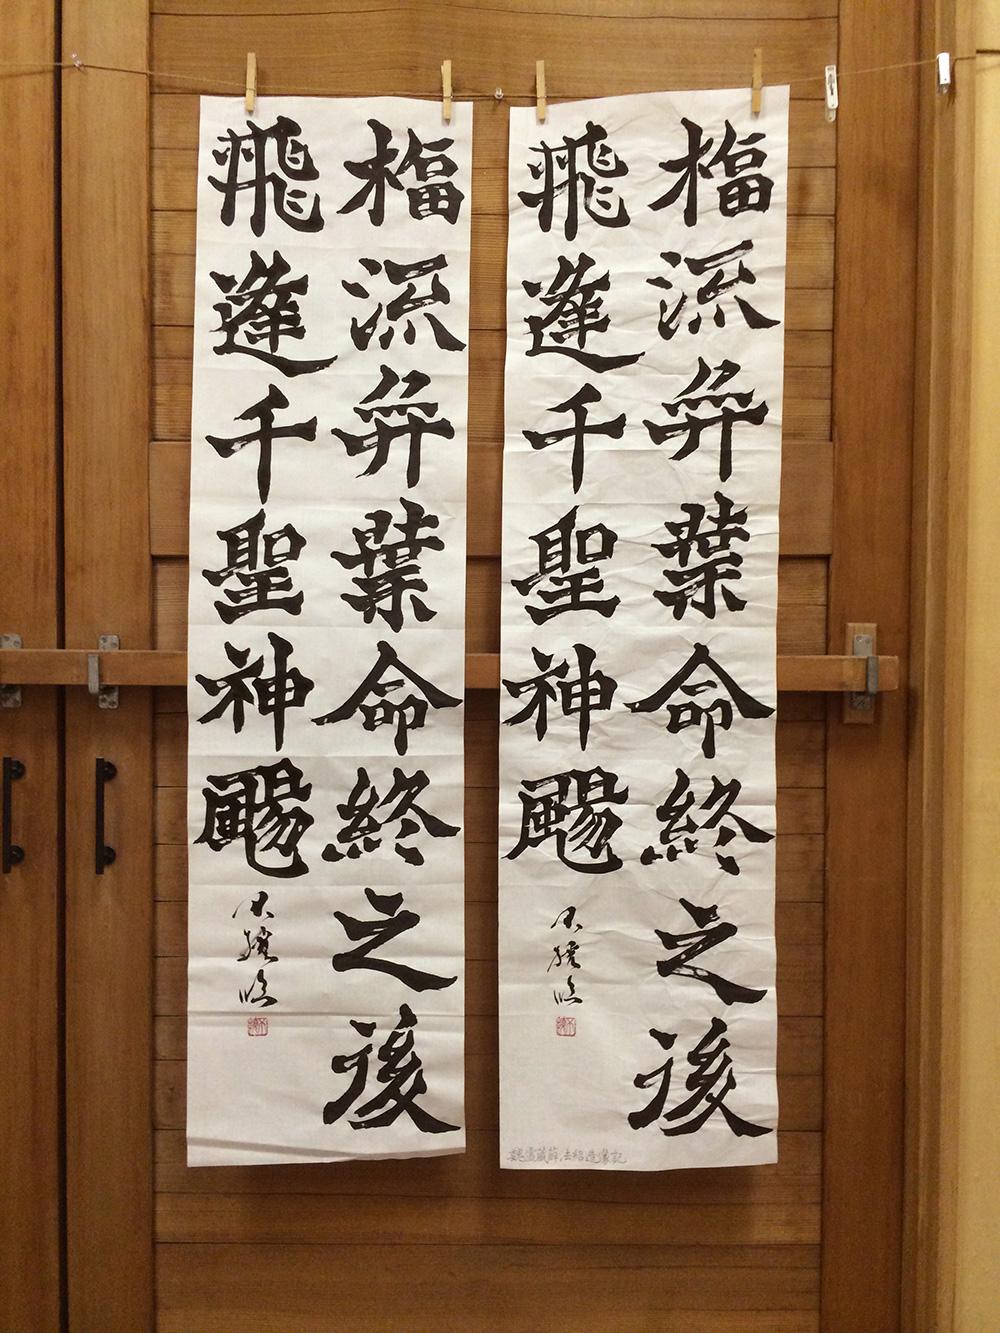 20140804_rin_gireizozoki_2.jpg